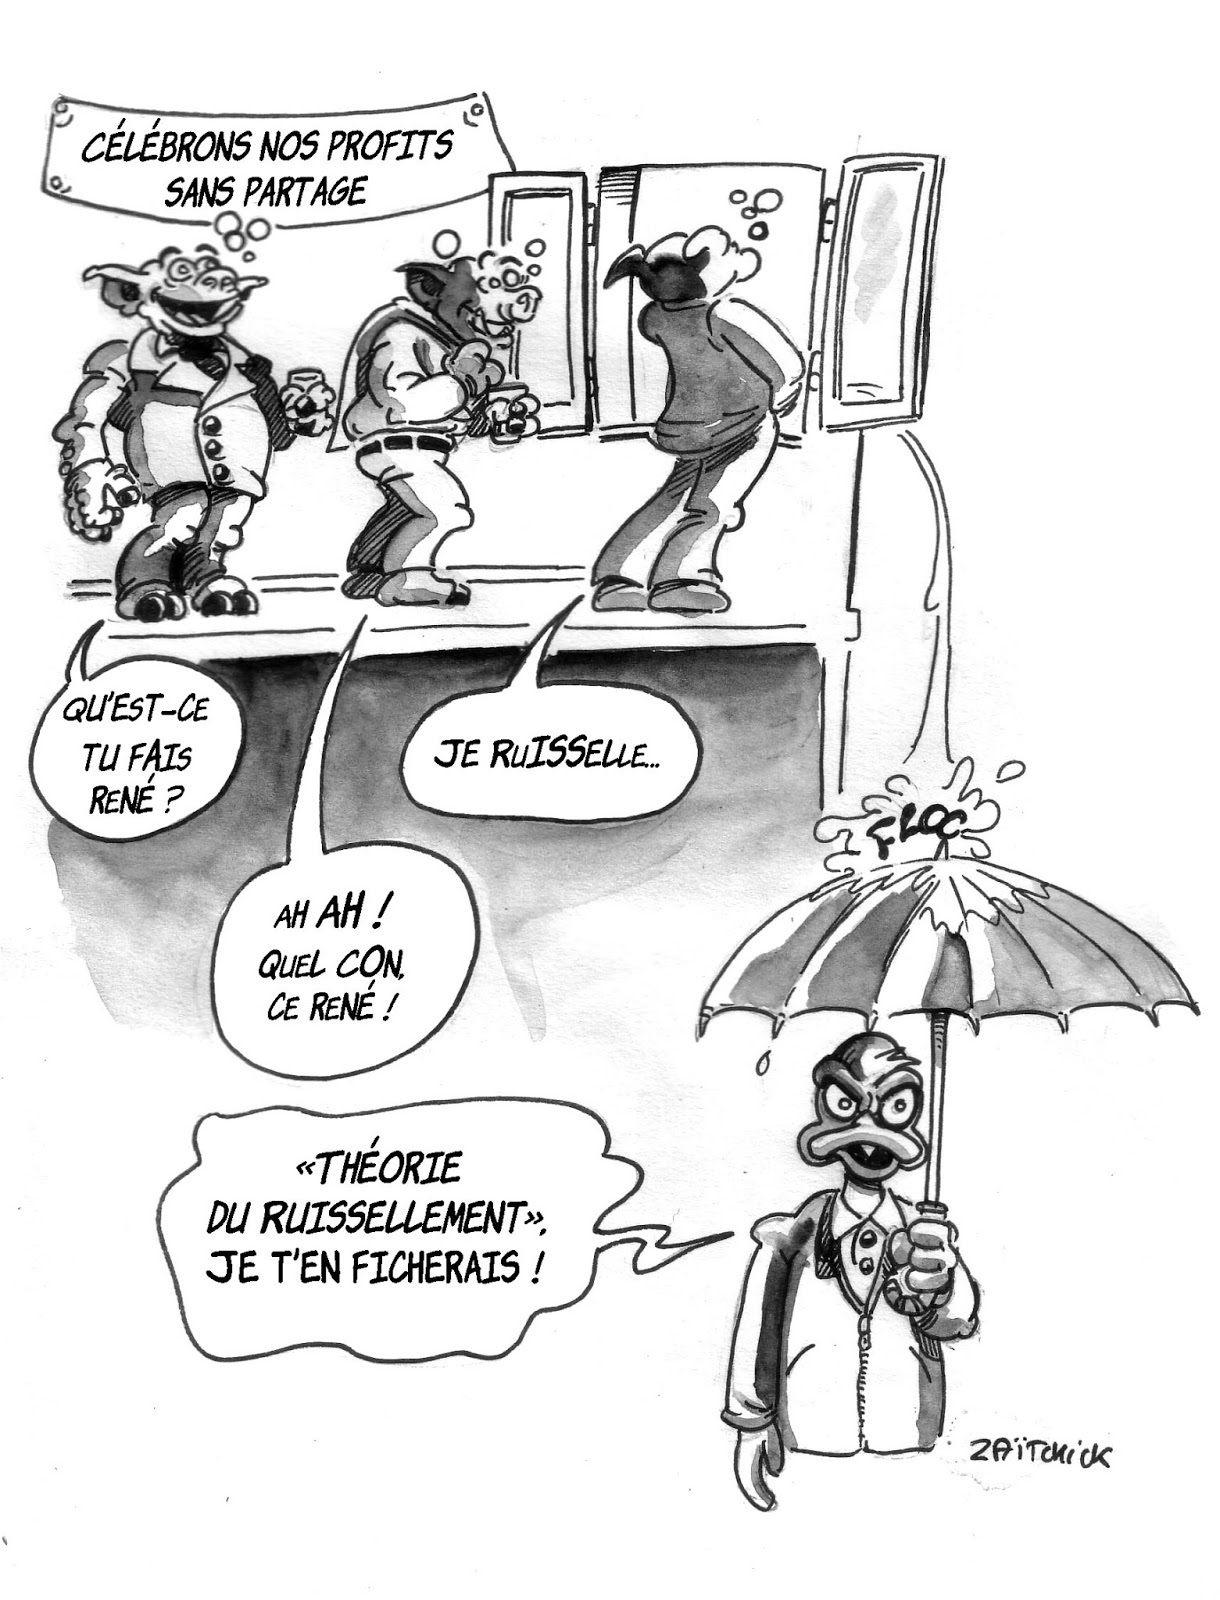 dessin humoristique illustrant la théorie du ruissellement